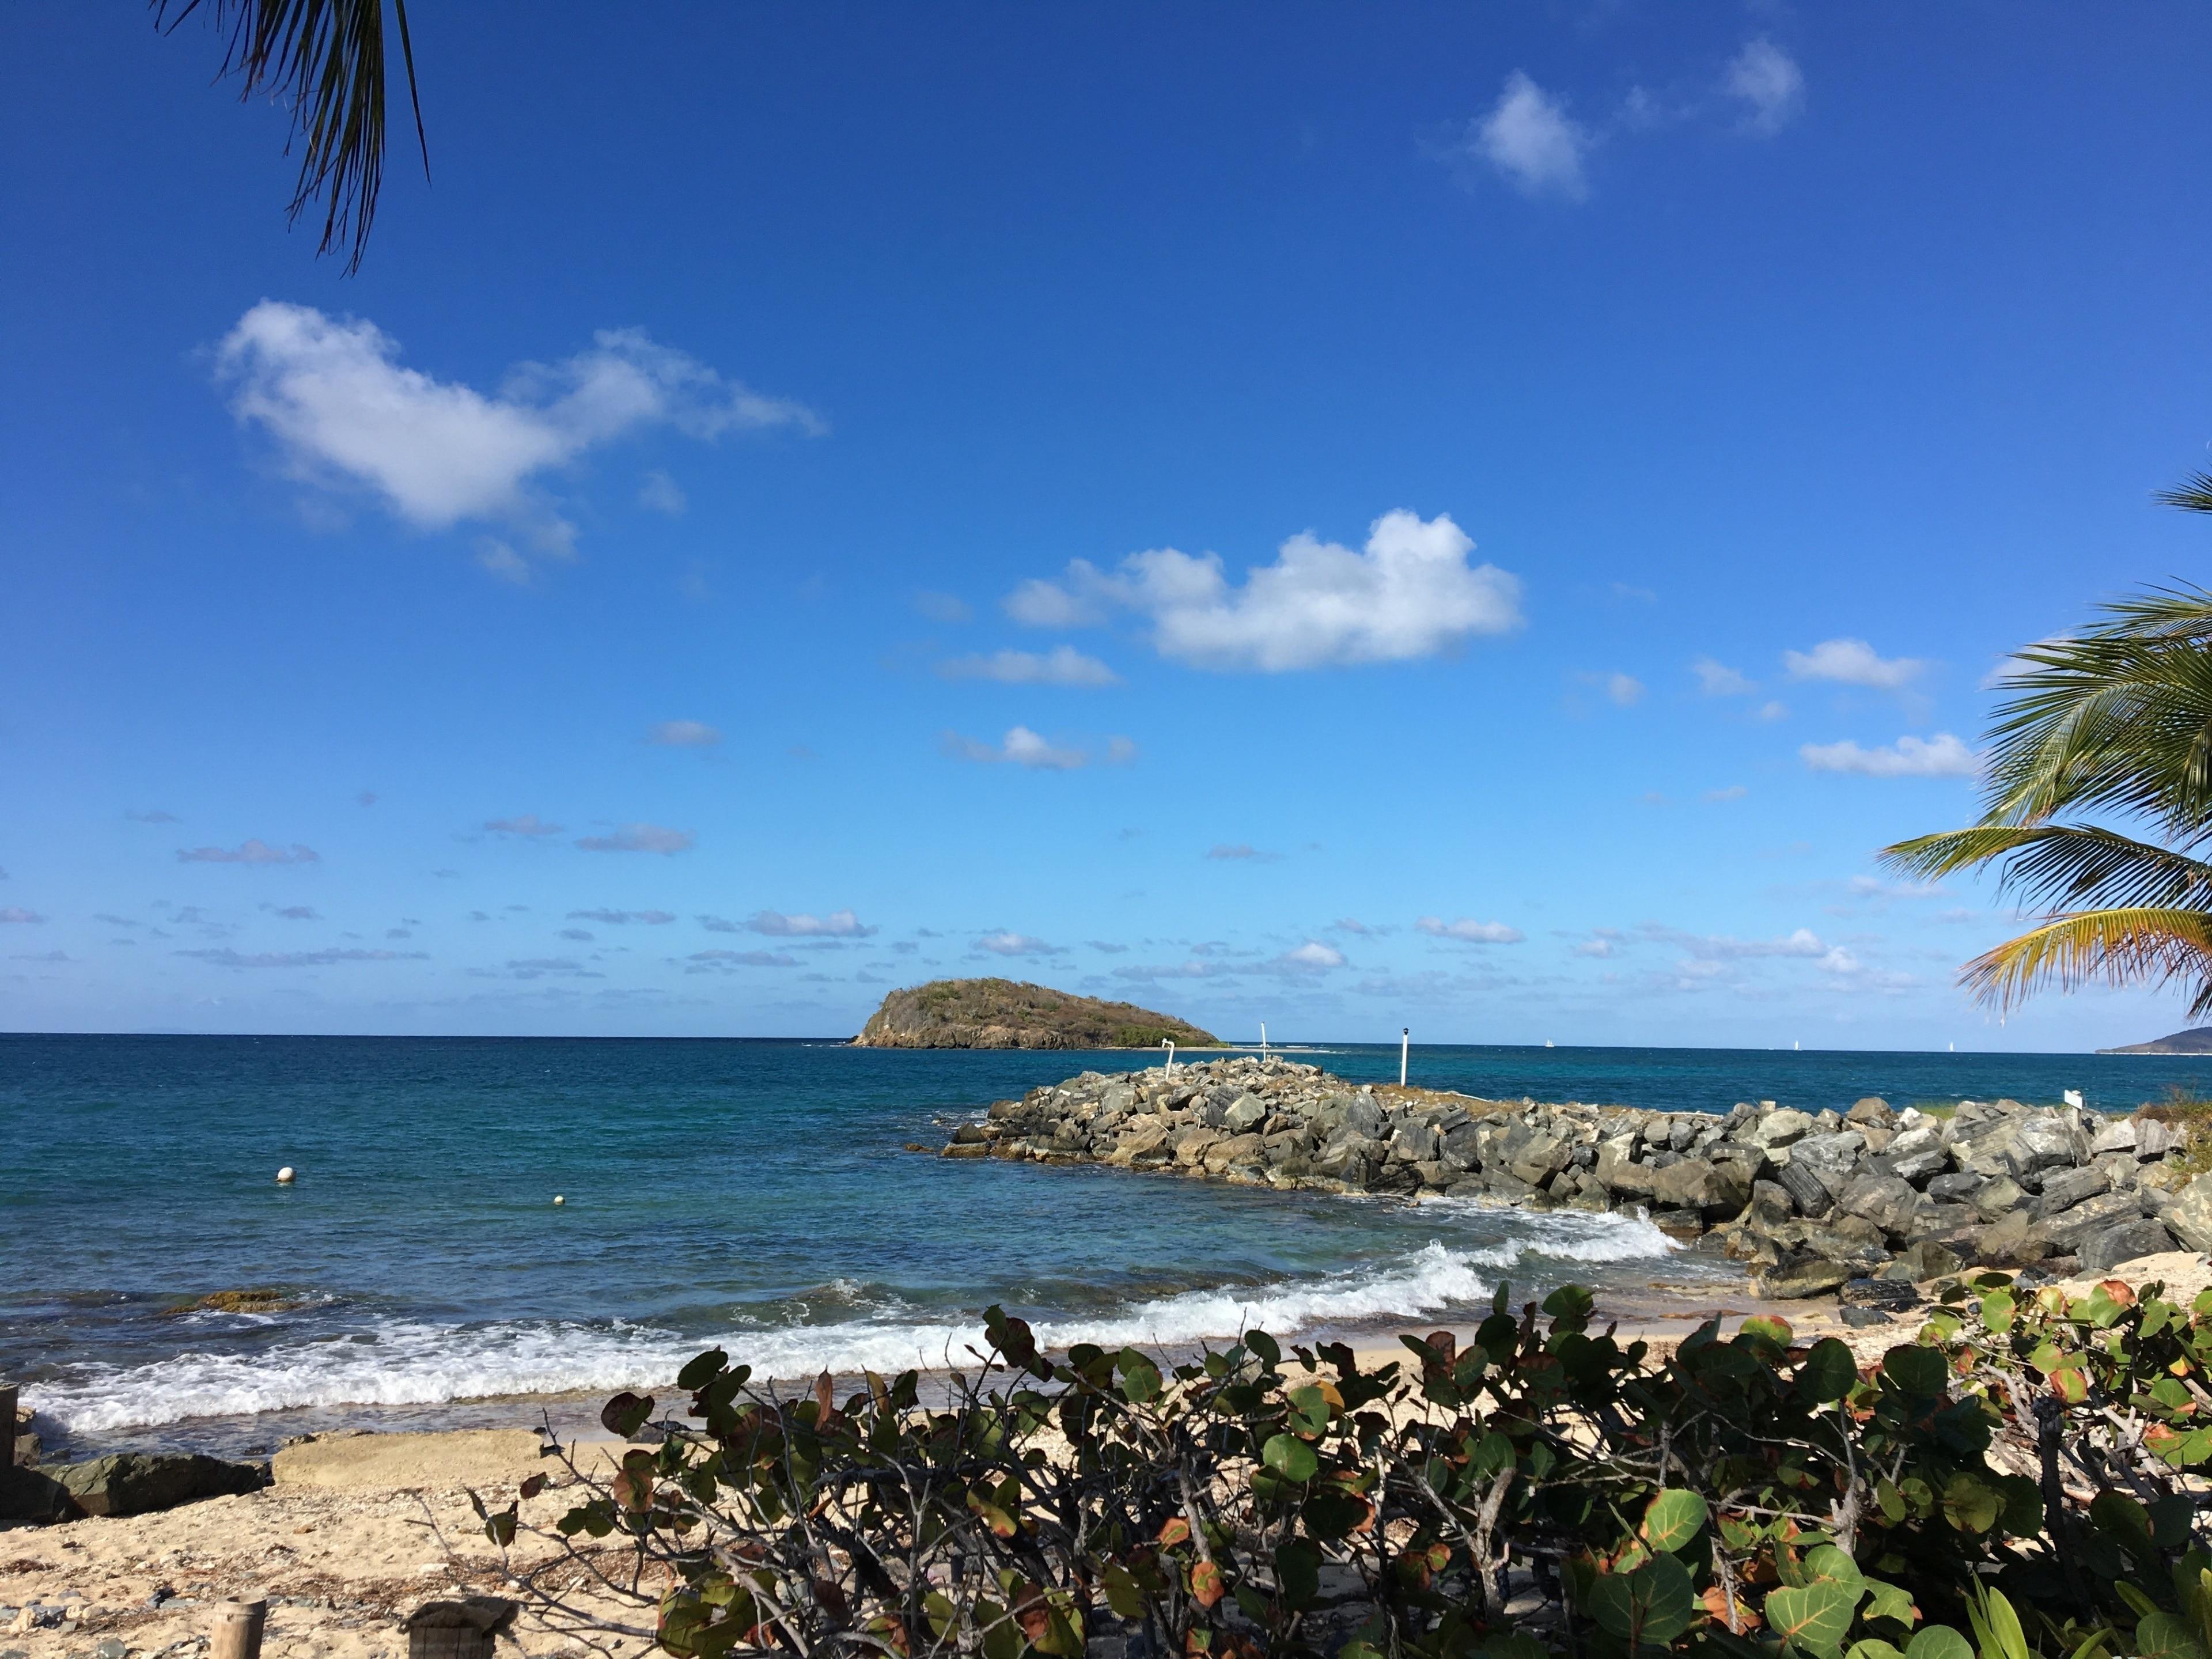 Northcentral, St. Croix Island, Yhdysvaltain Neitsytsaaret